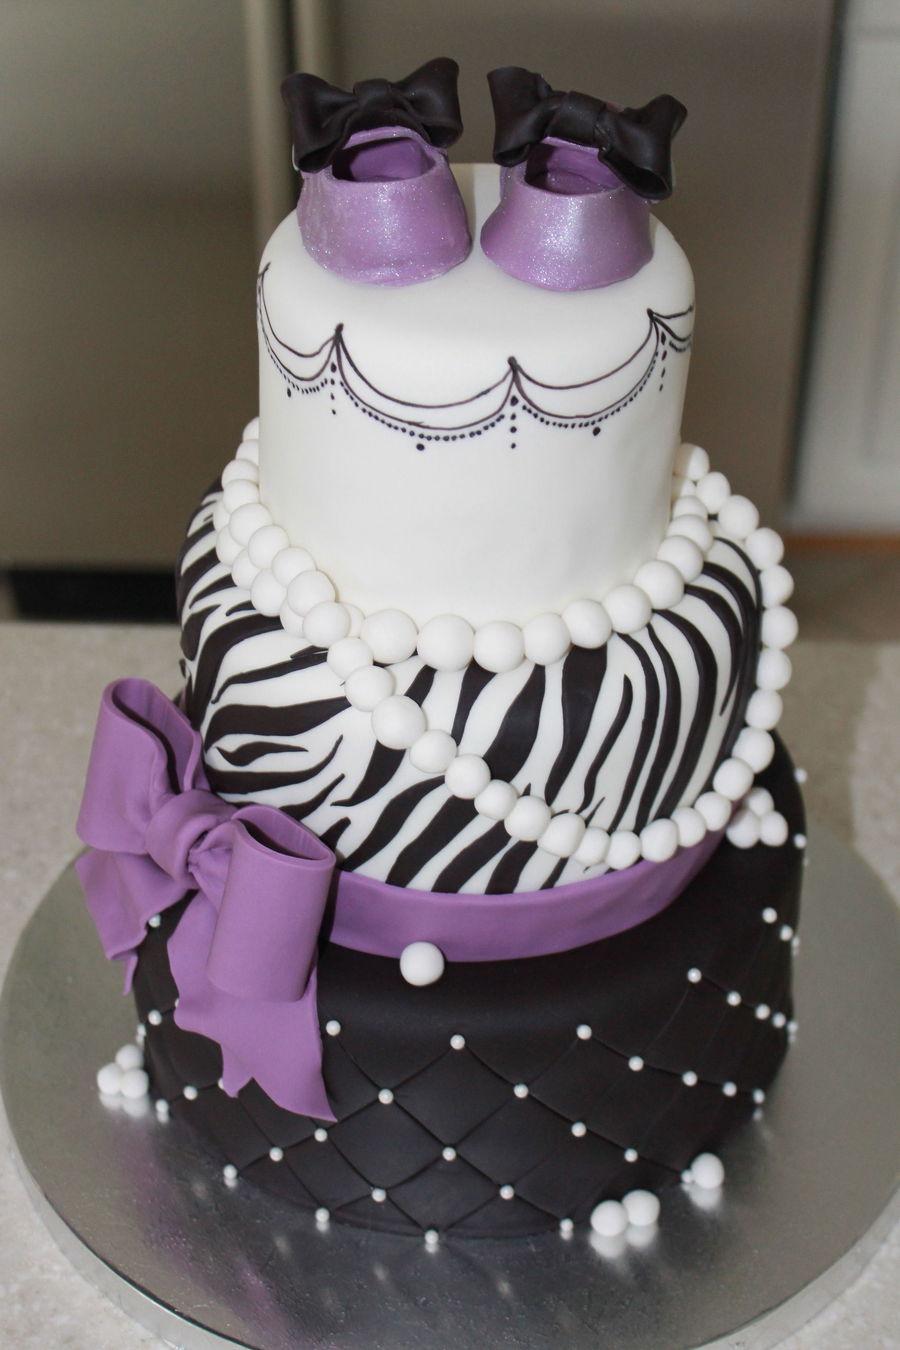 Purple and Black Zebra Baby Shower Cake